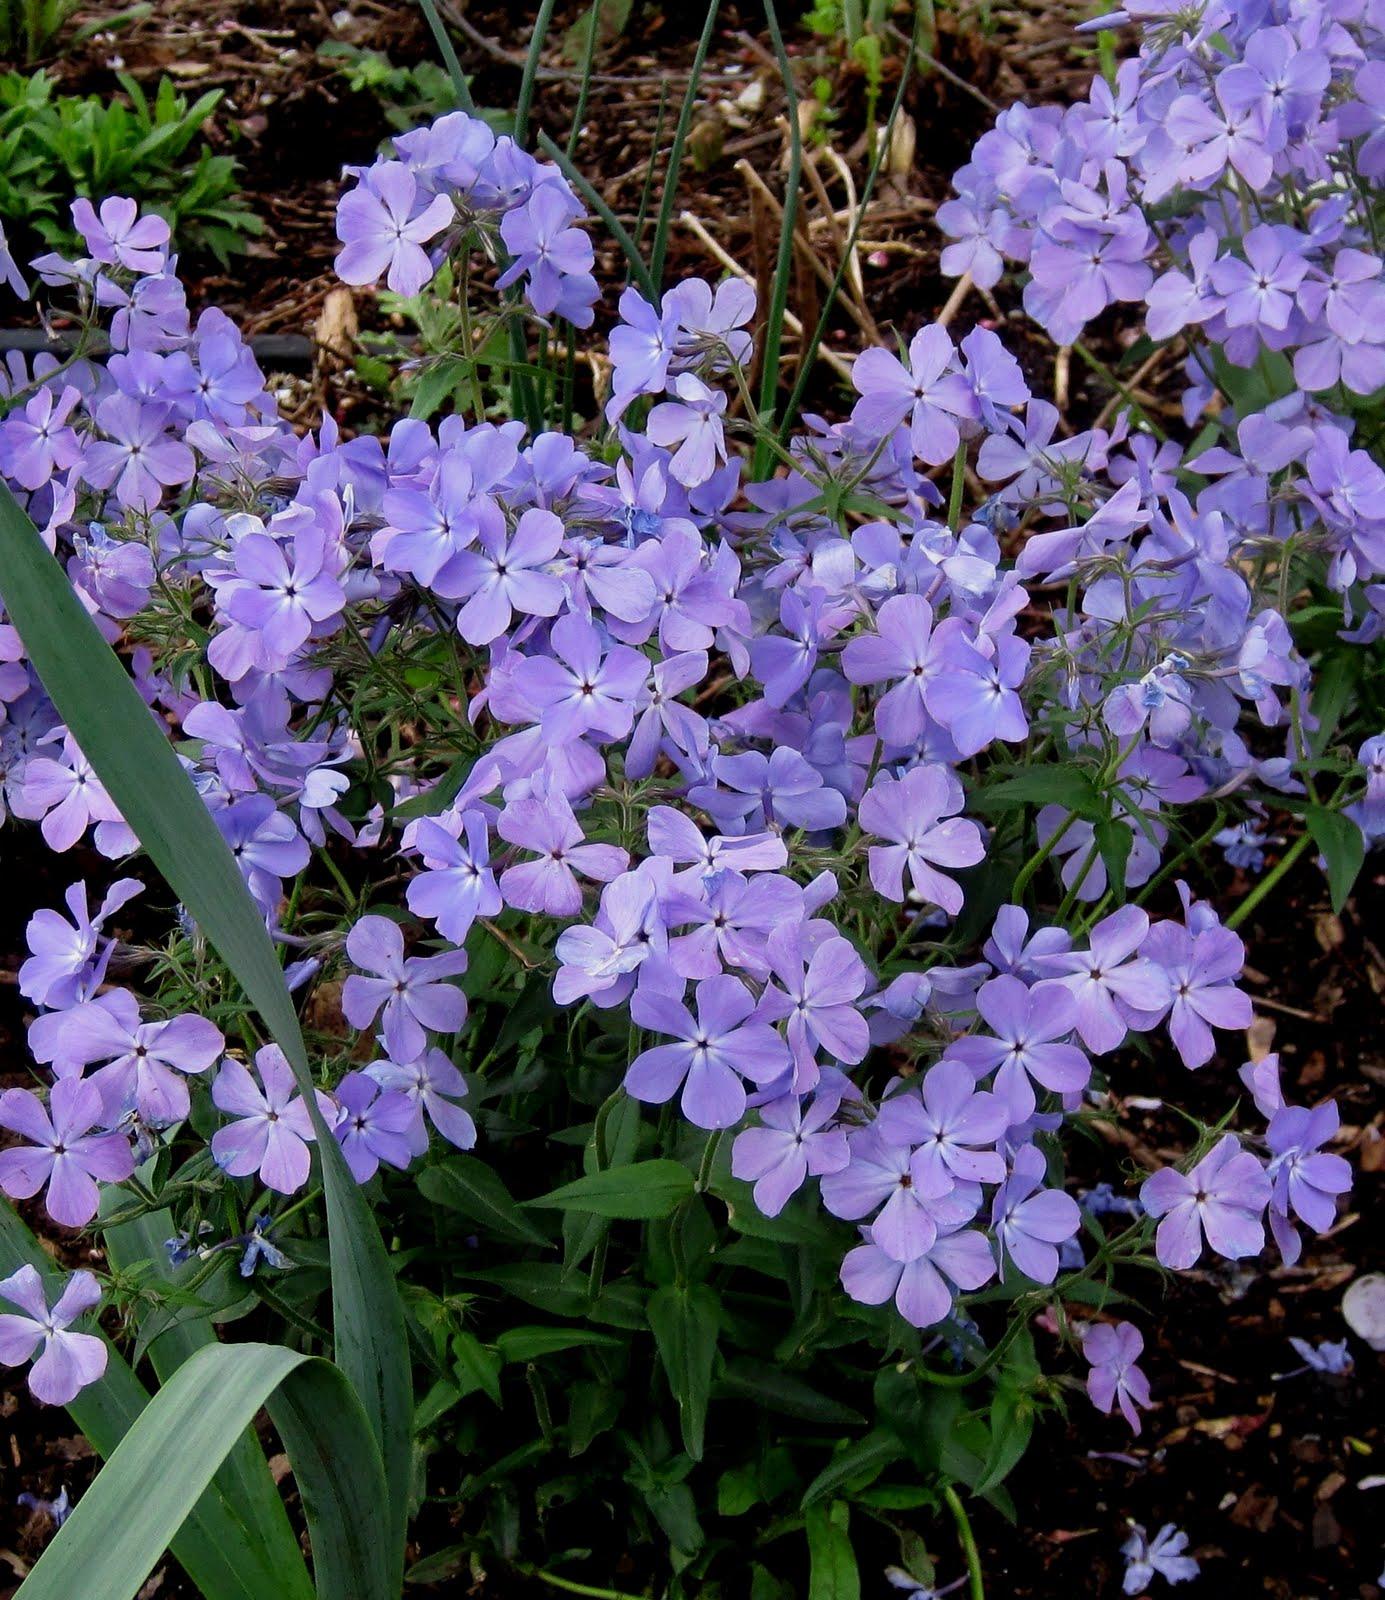 Franklin county pa gardeners bloom day part 1 june 4 2011 phlox divaricata blue moon izmirmasajfo